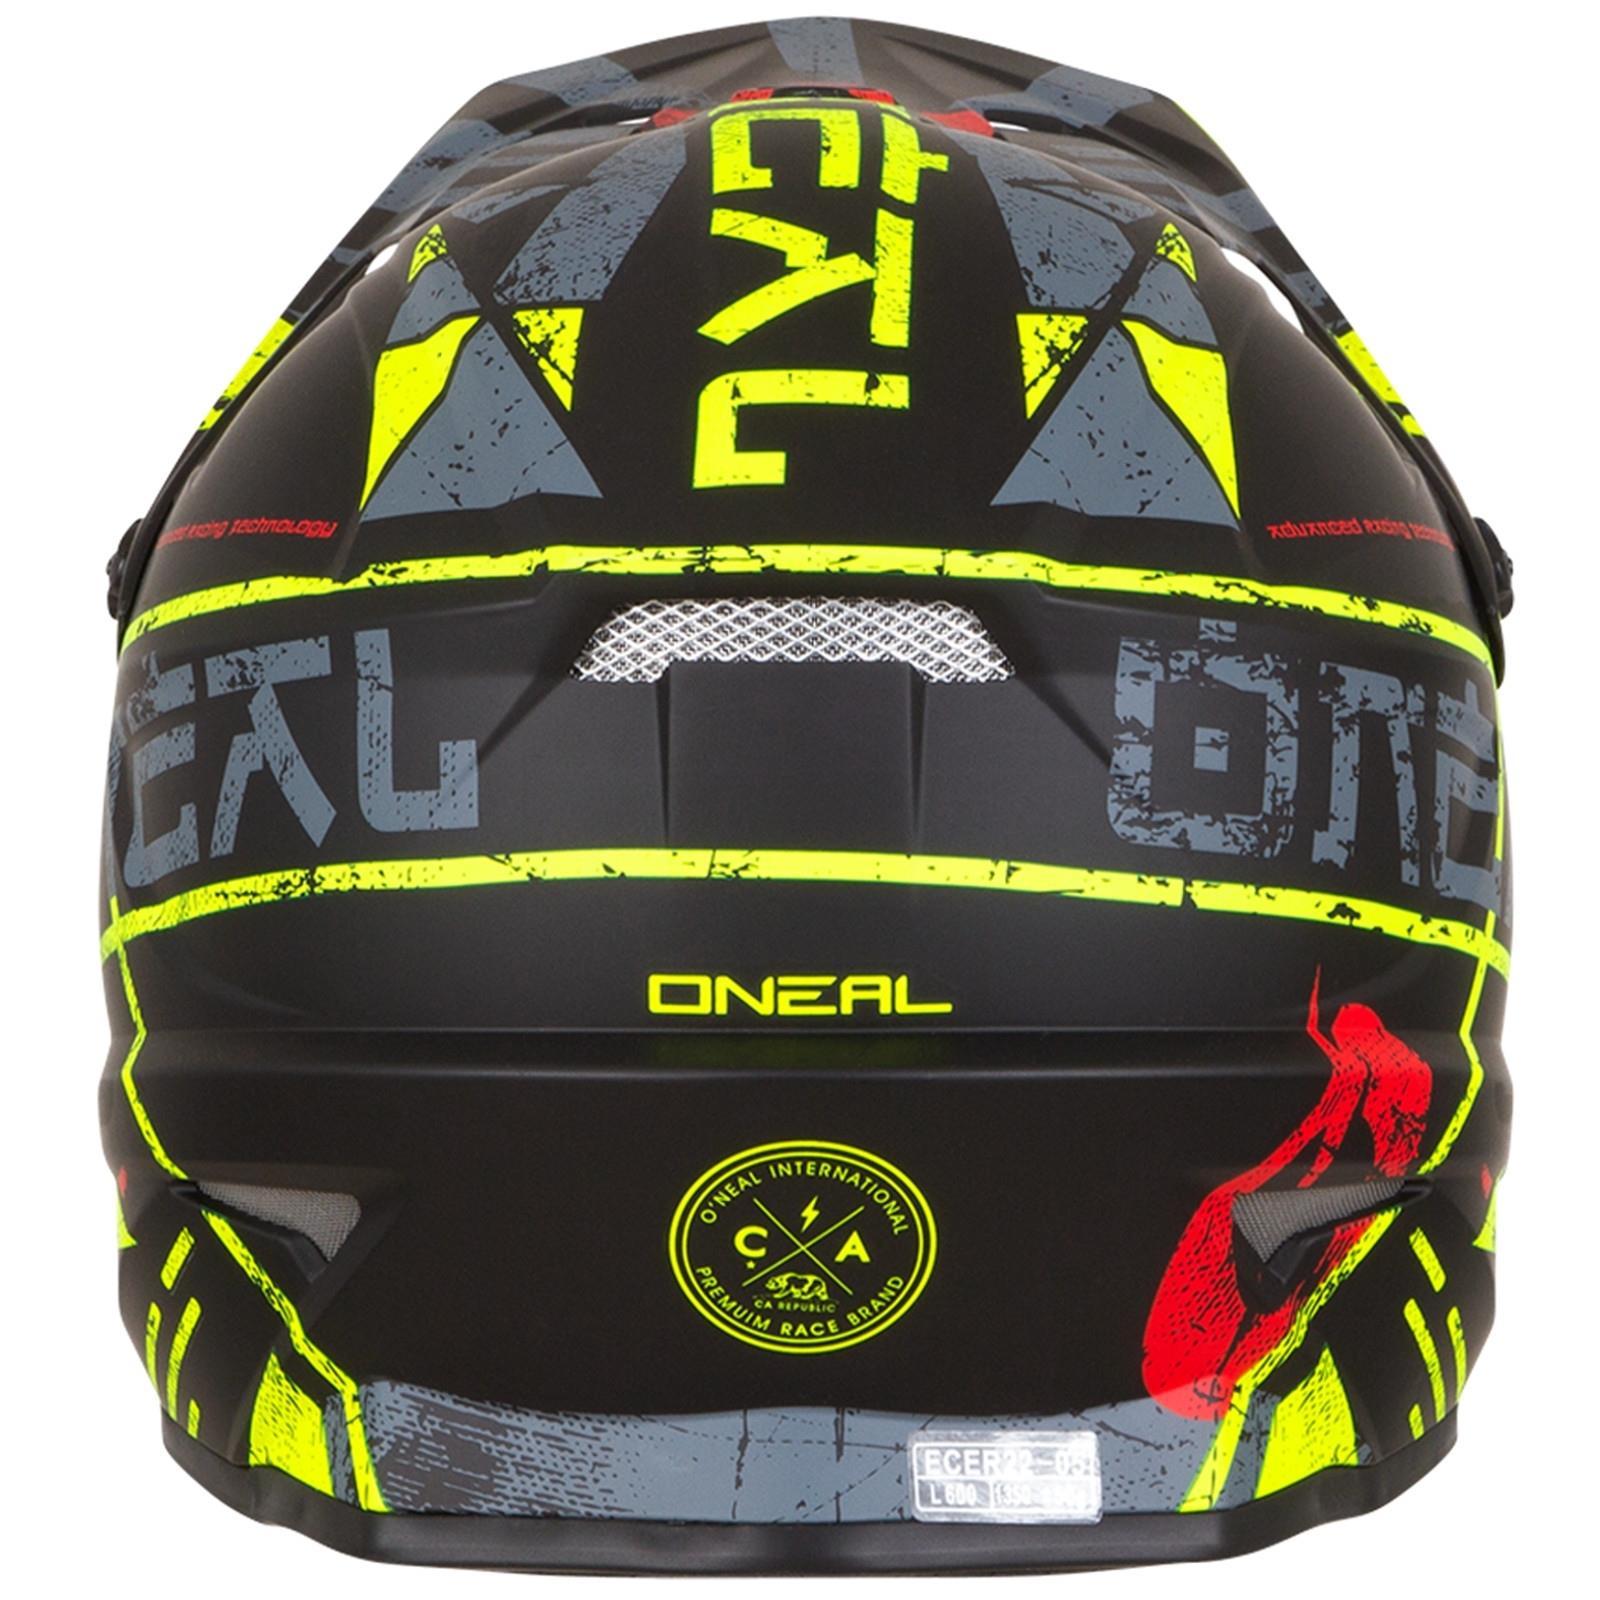 ONeal-Motocross-casco-MX-ENDURO-MOTO-BICI-FUORISTRADA-CROSS-Series-Adventure miniatura 27